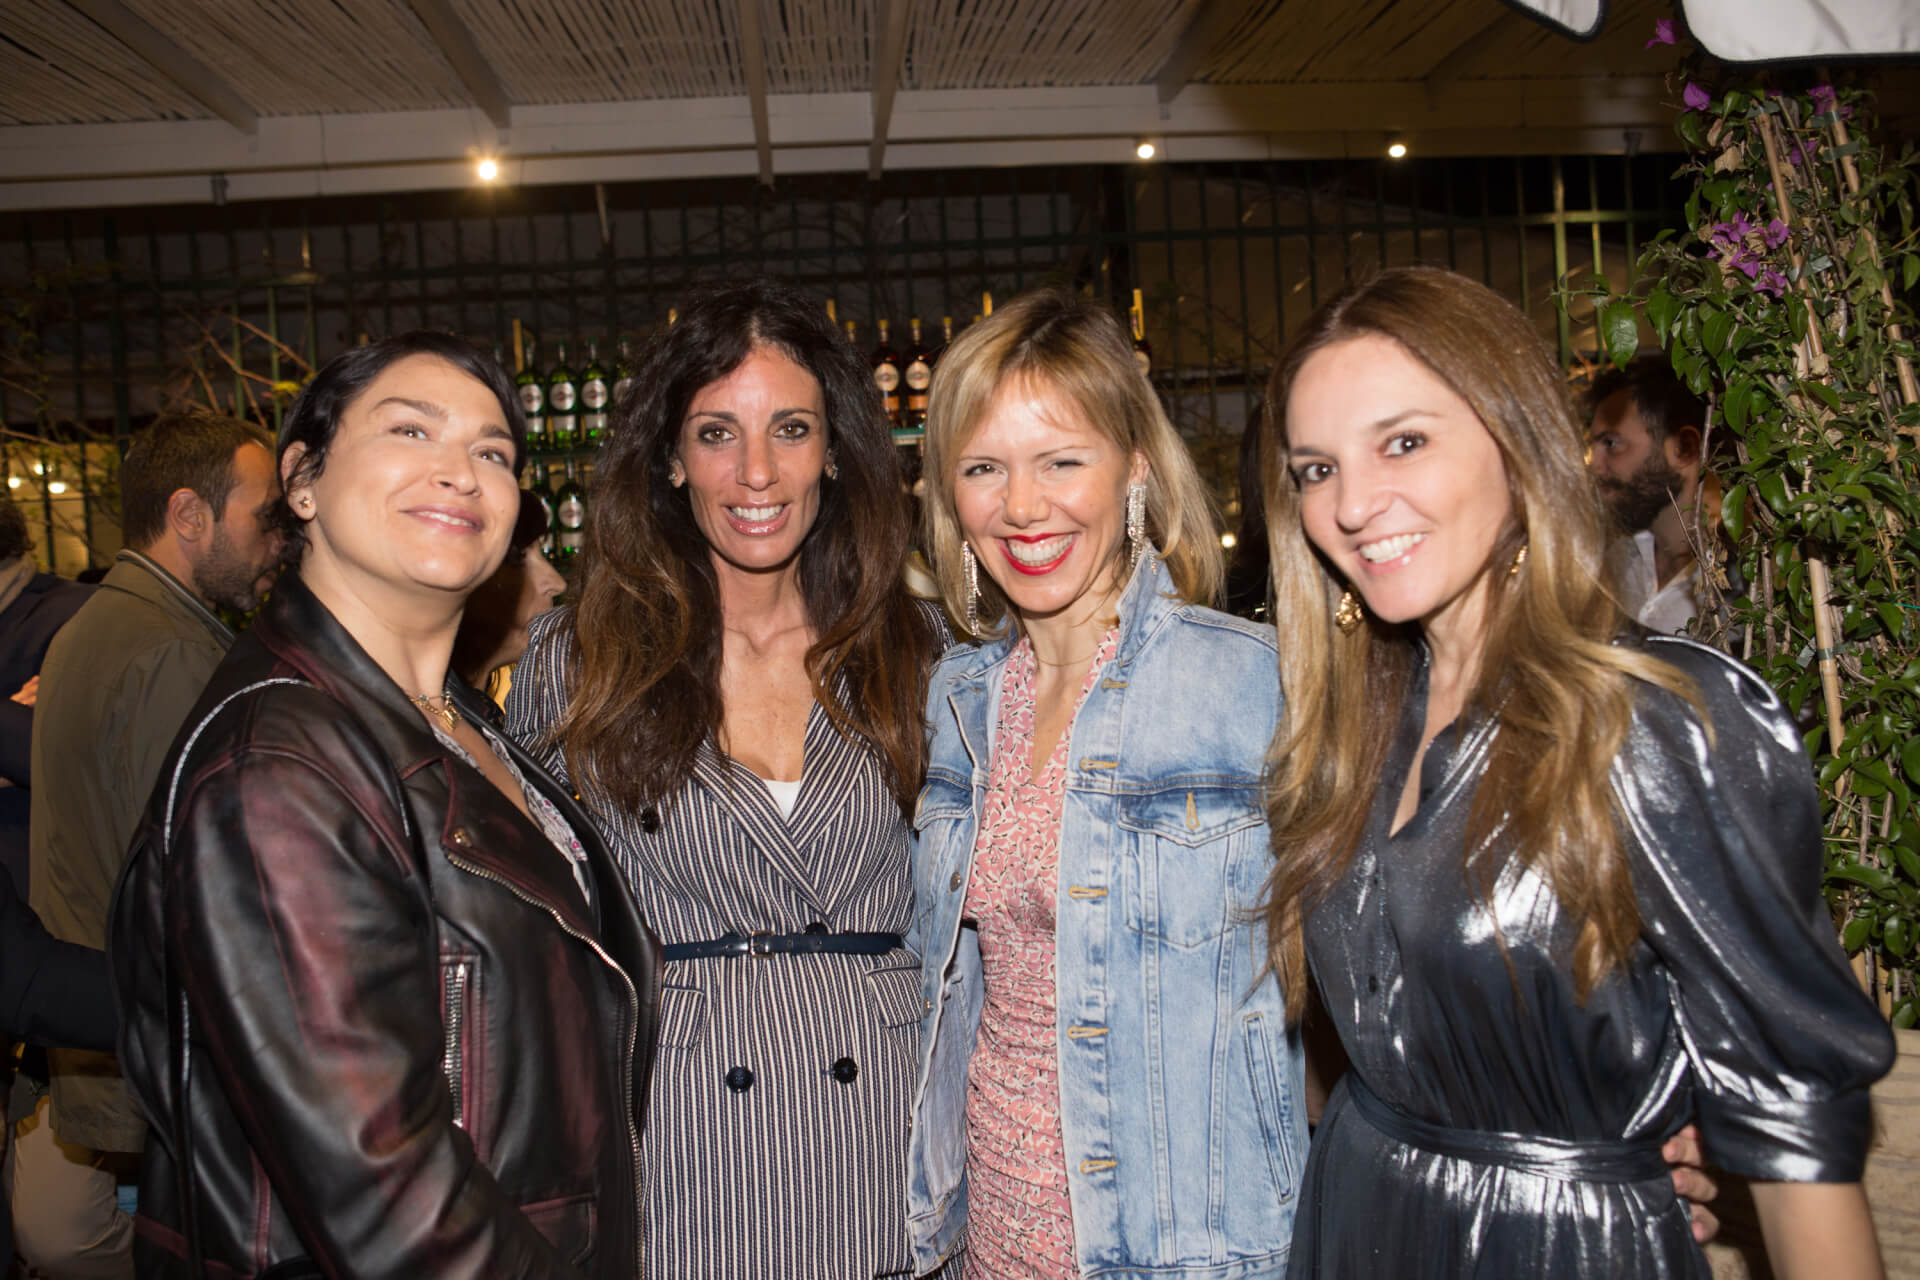 Viola Melpignano, Carlotta Lana, Simona Cutrupi, Lorenza de Paola